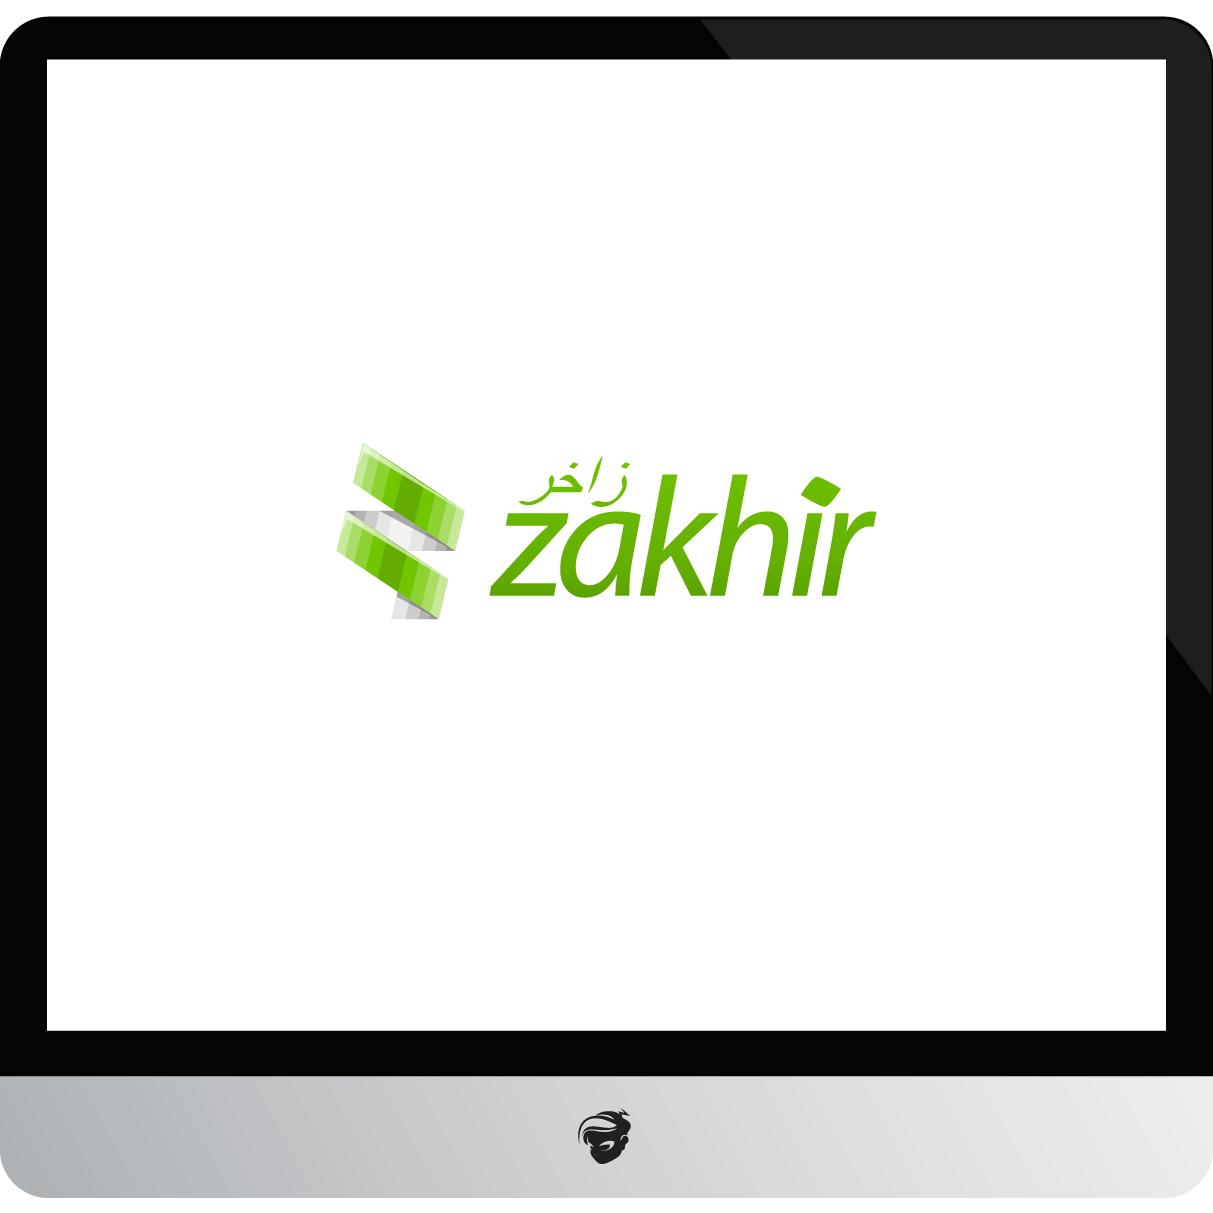 Logo Design by zesthar - Entry No. 99 in the Logo Design Contest Zakhir Logo Design.